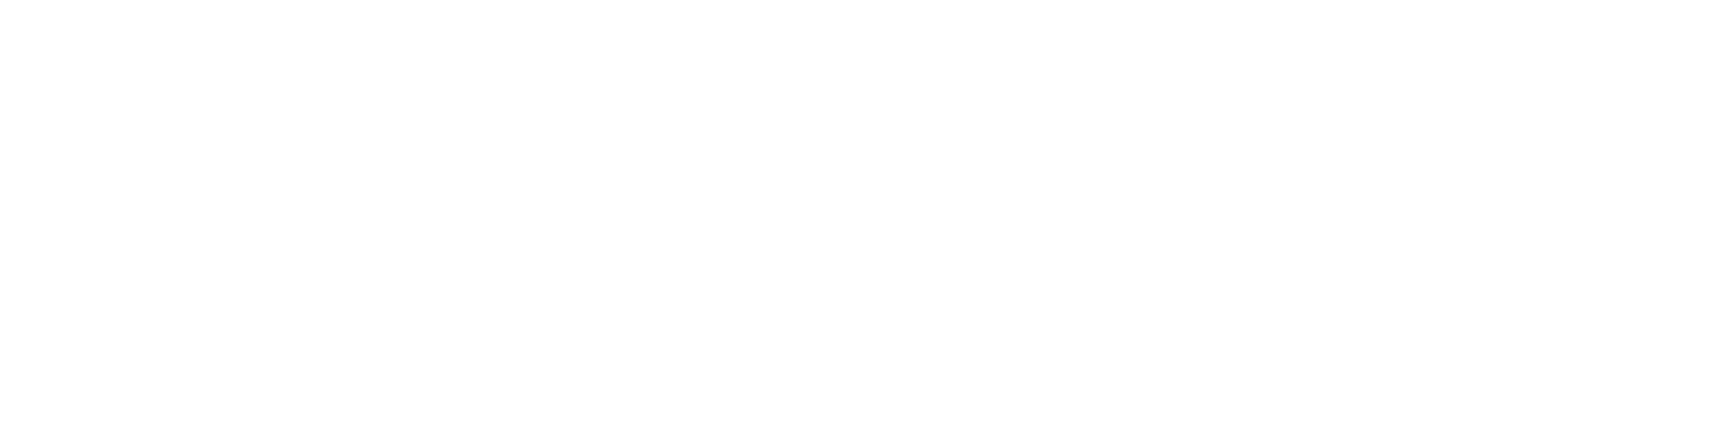 tikto-logo-site-white tikto, tikto athens, handmade cloths, greek cloths, handmade greek clothes, handmade greek fashion, greek designer, fashion brand, greek brand, greek products